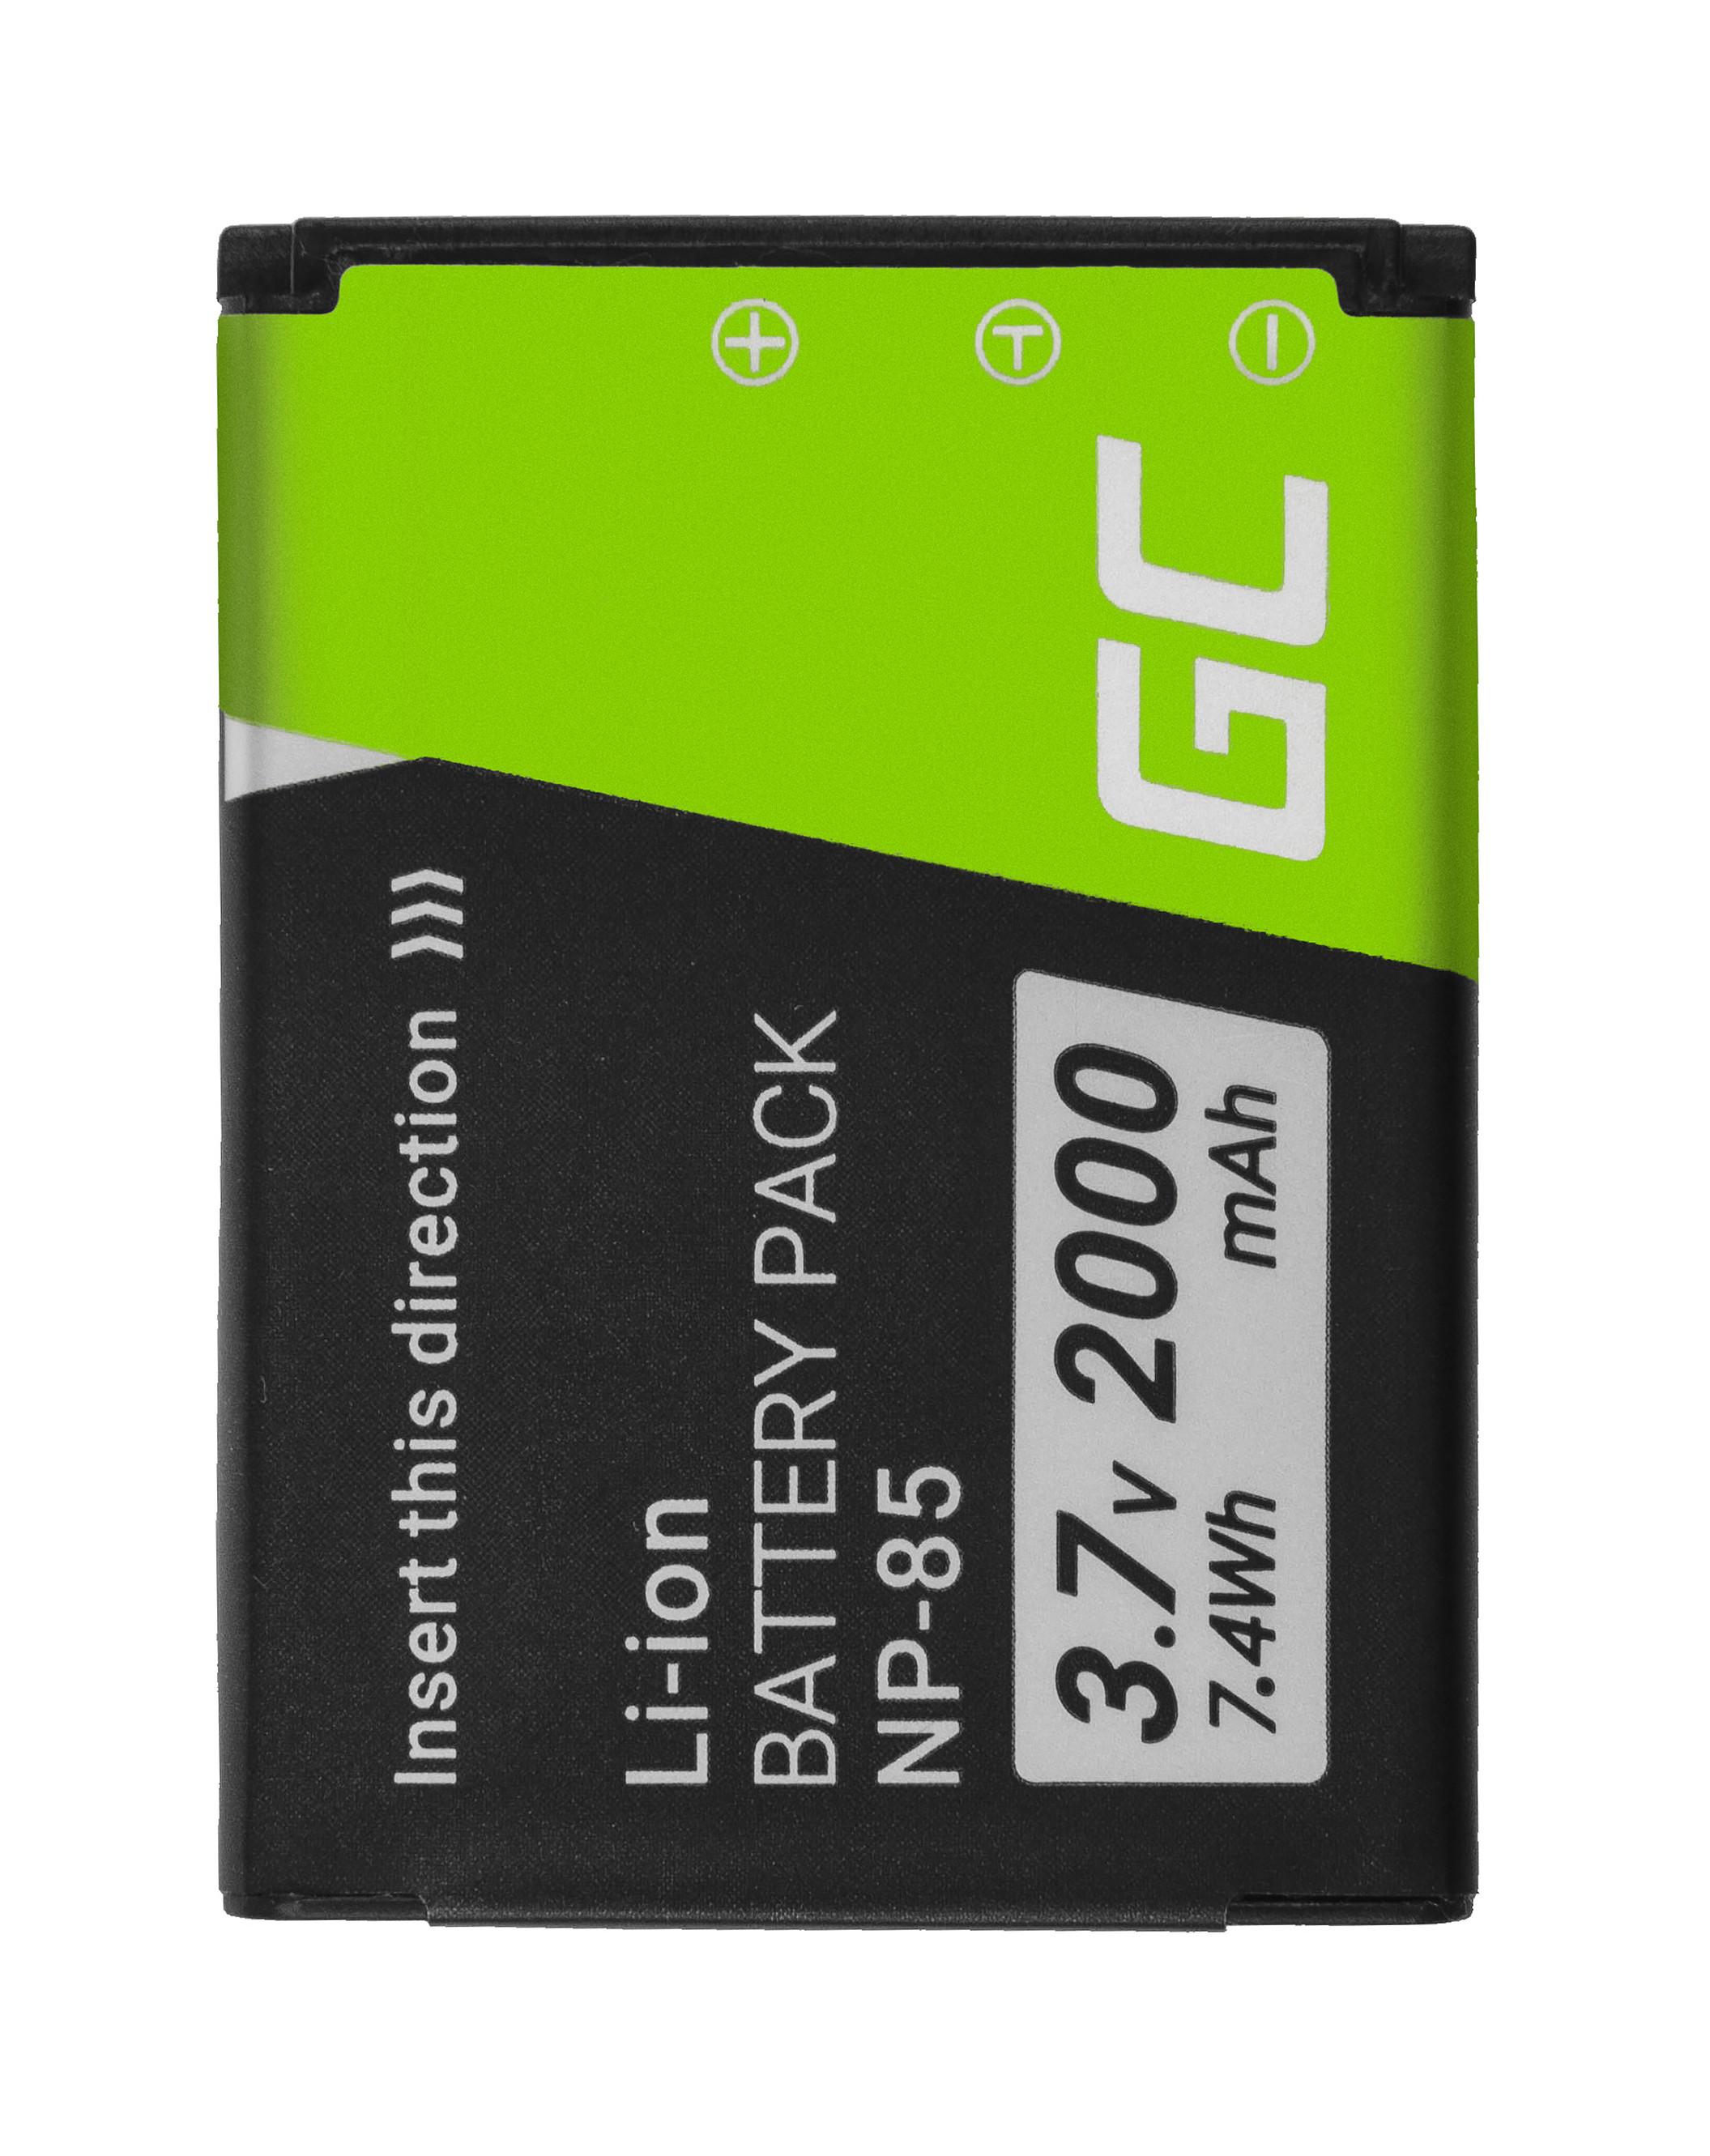 Baterie Green Cell FujiFilm NP-85 NP85, pro FujiFilm FinePix SL300, SL305, SL280, SL260, SL240 3.7V 2000mAh Li-ion - neoriginální